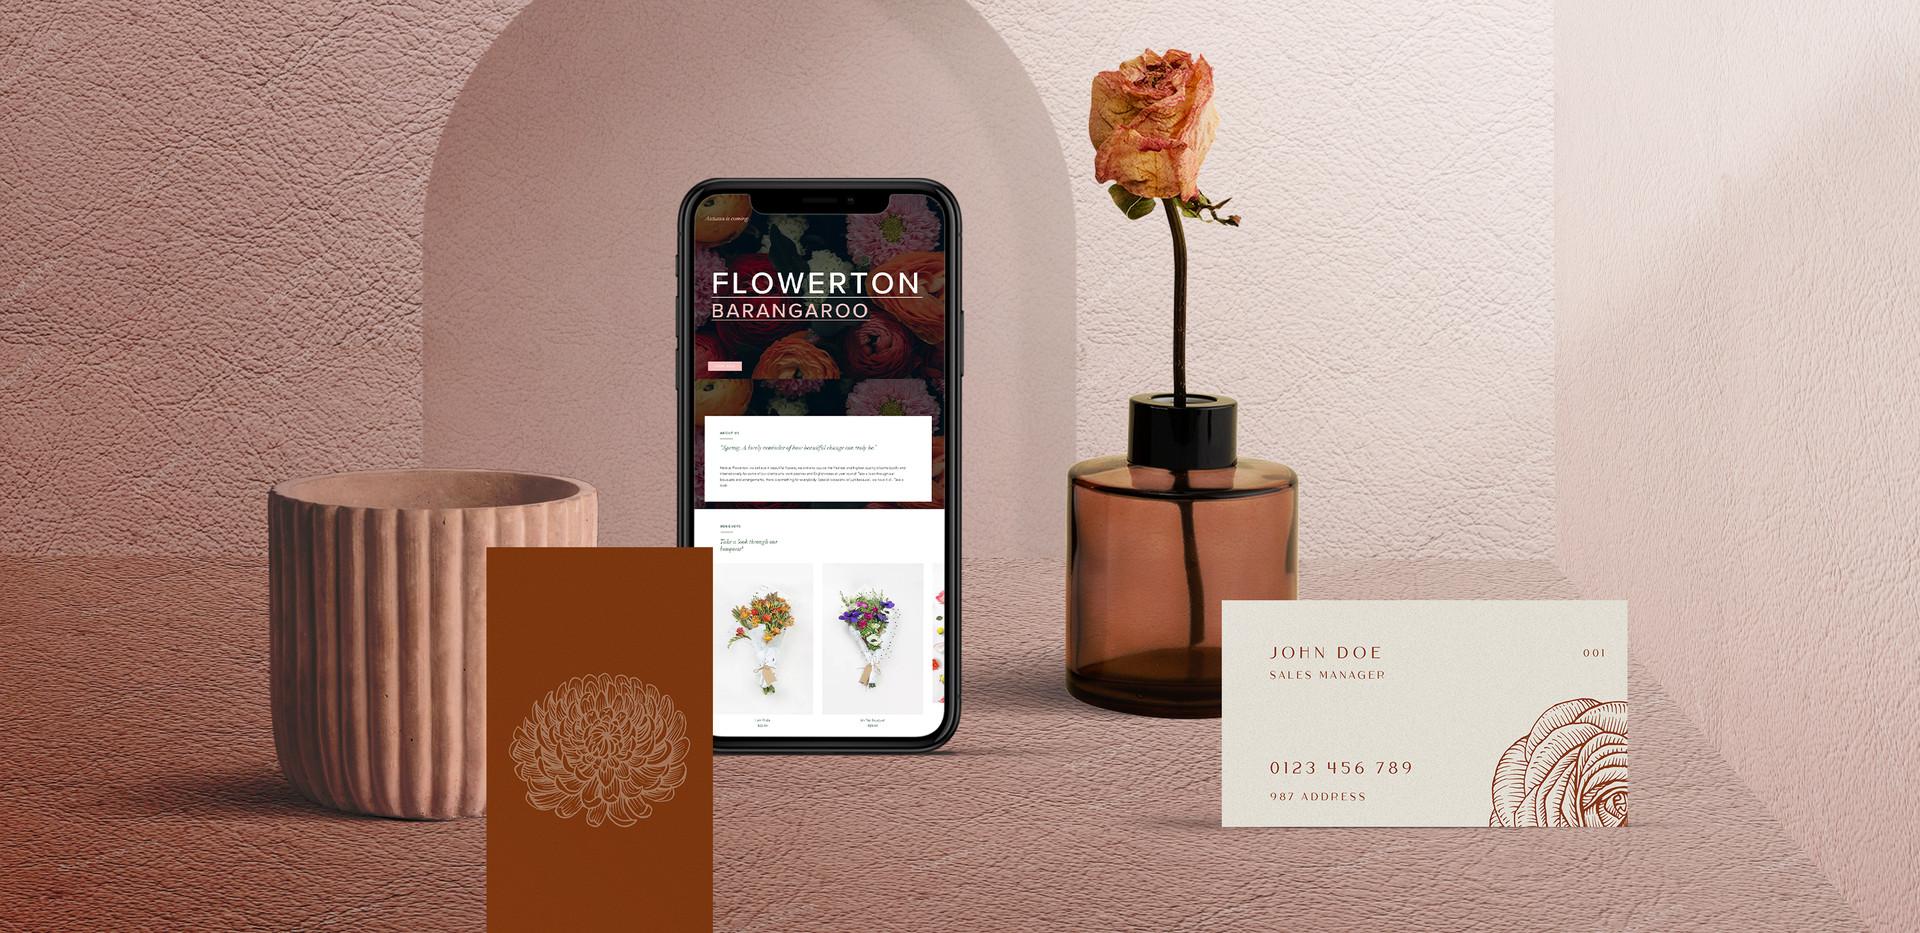 Flowerton